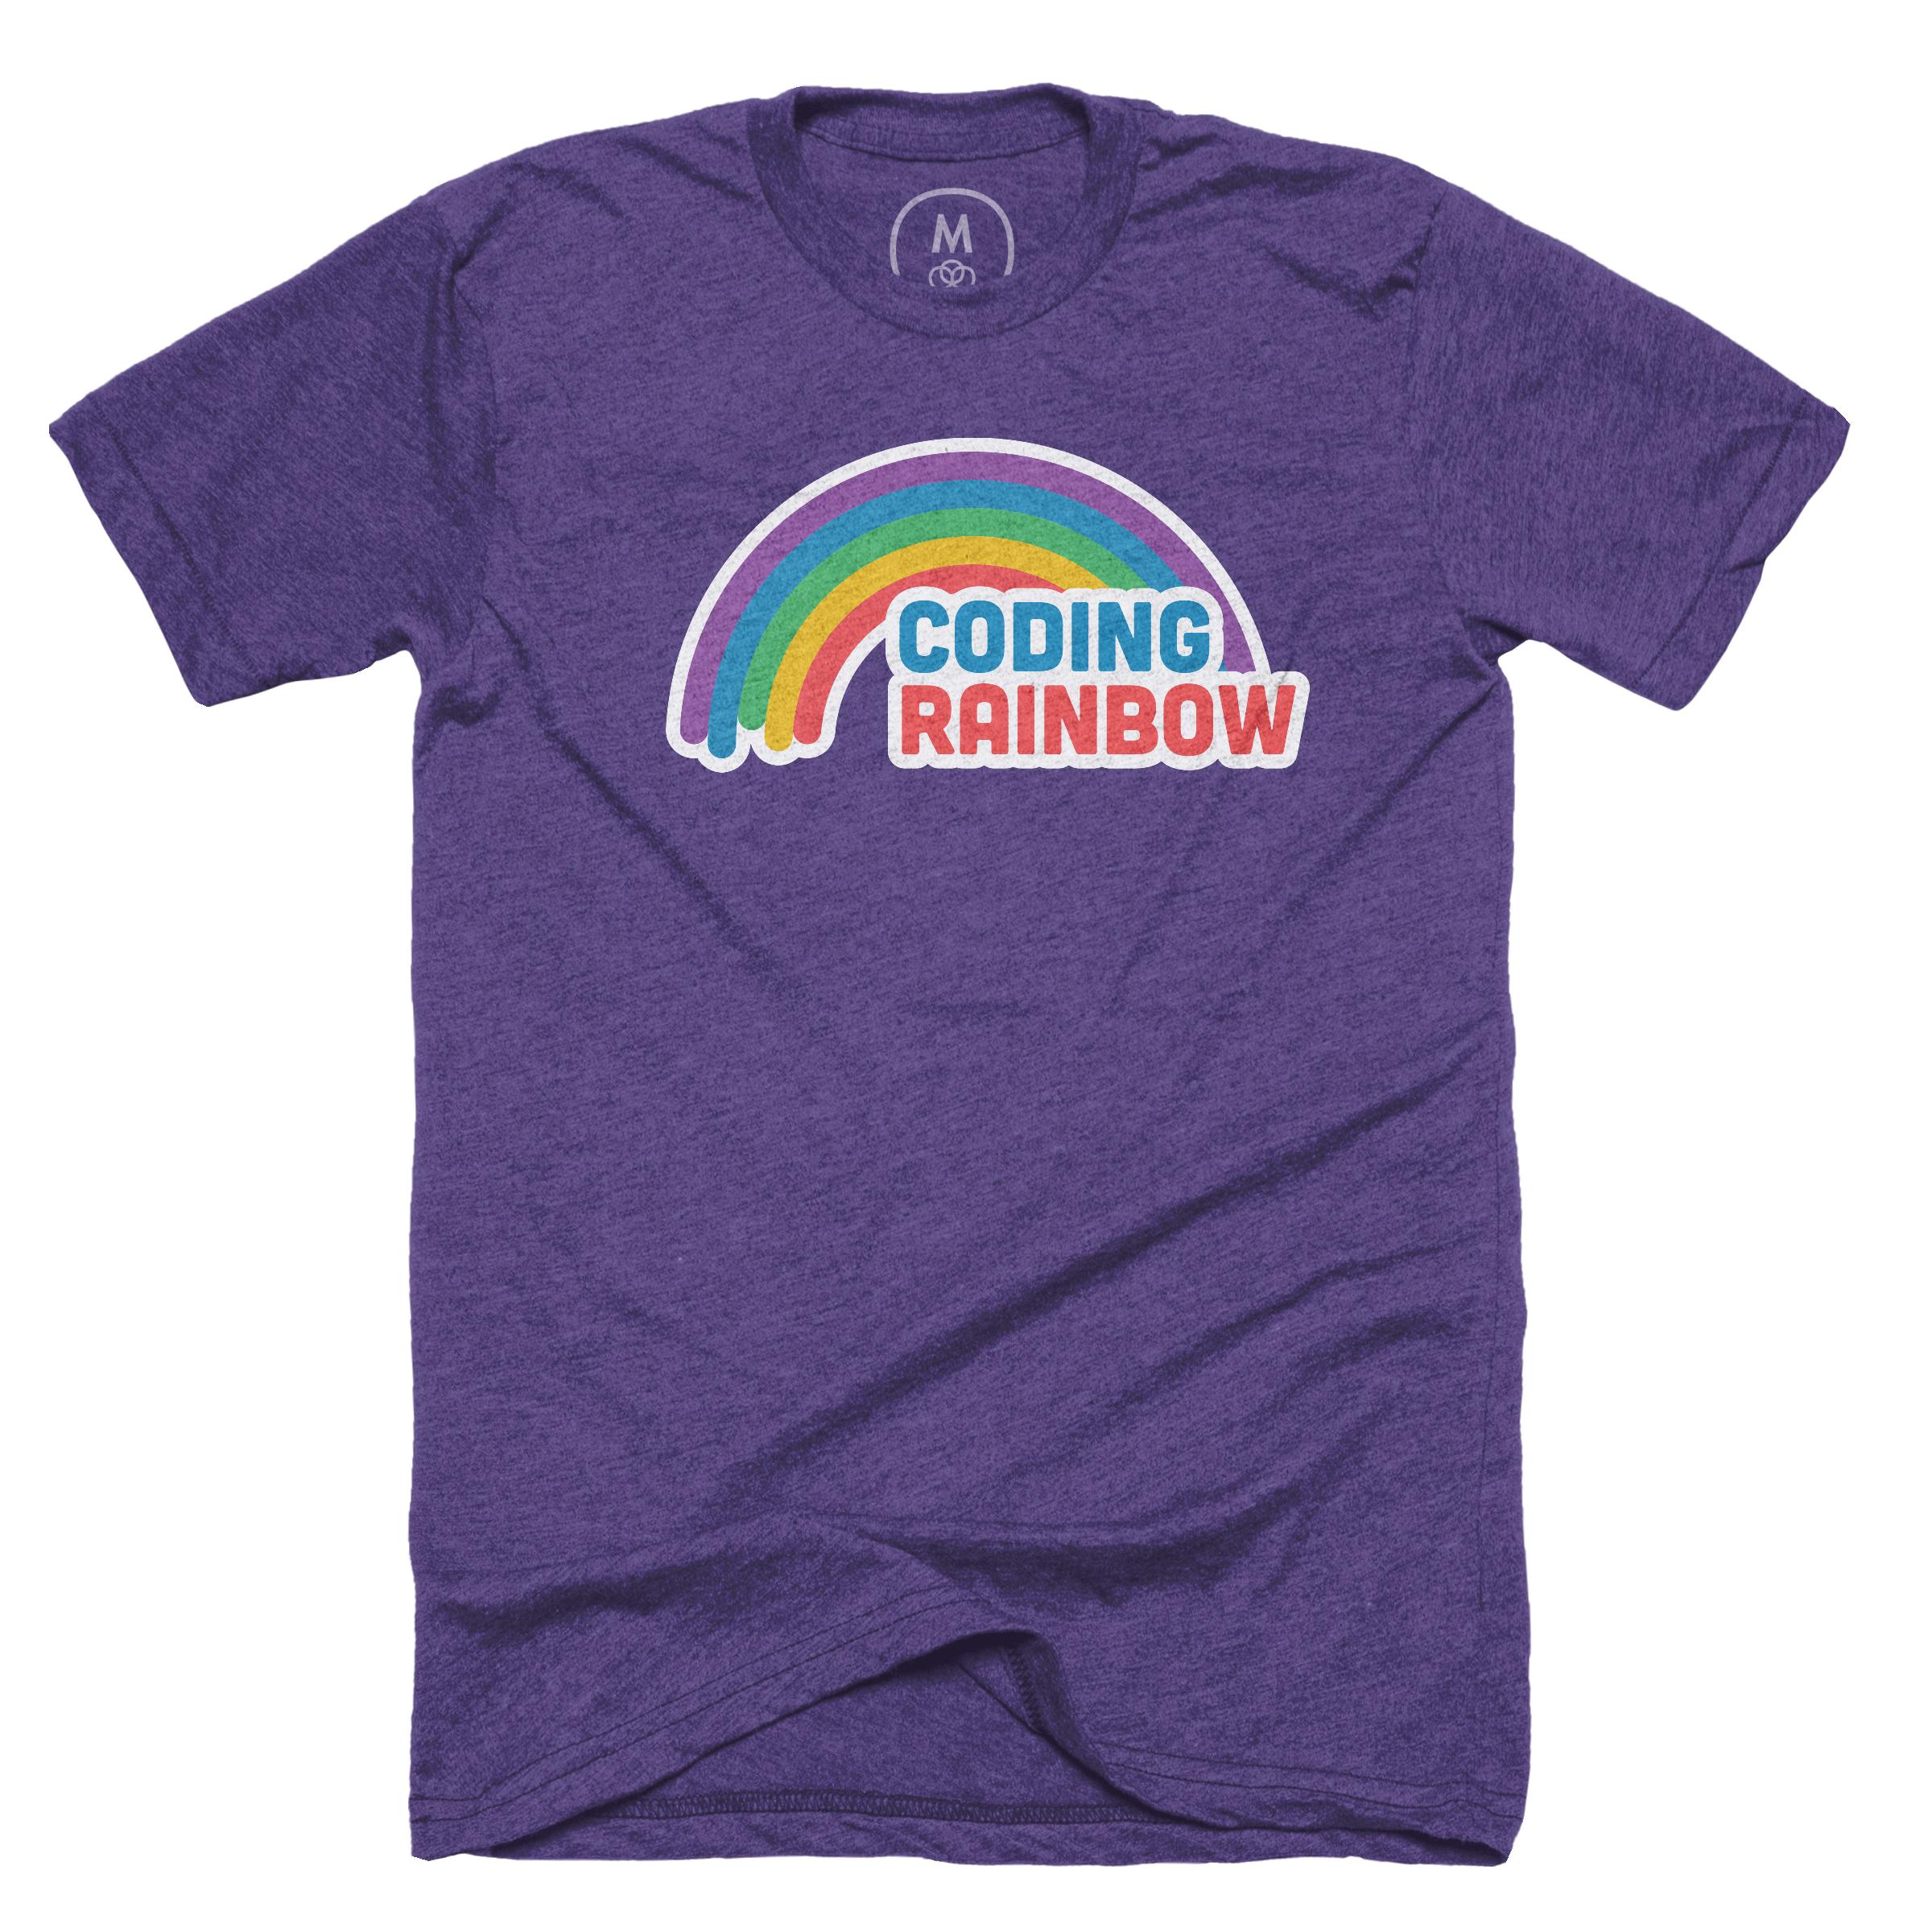 Coding Rainbow